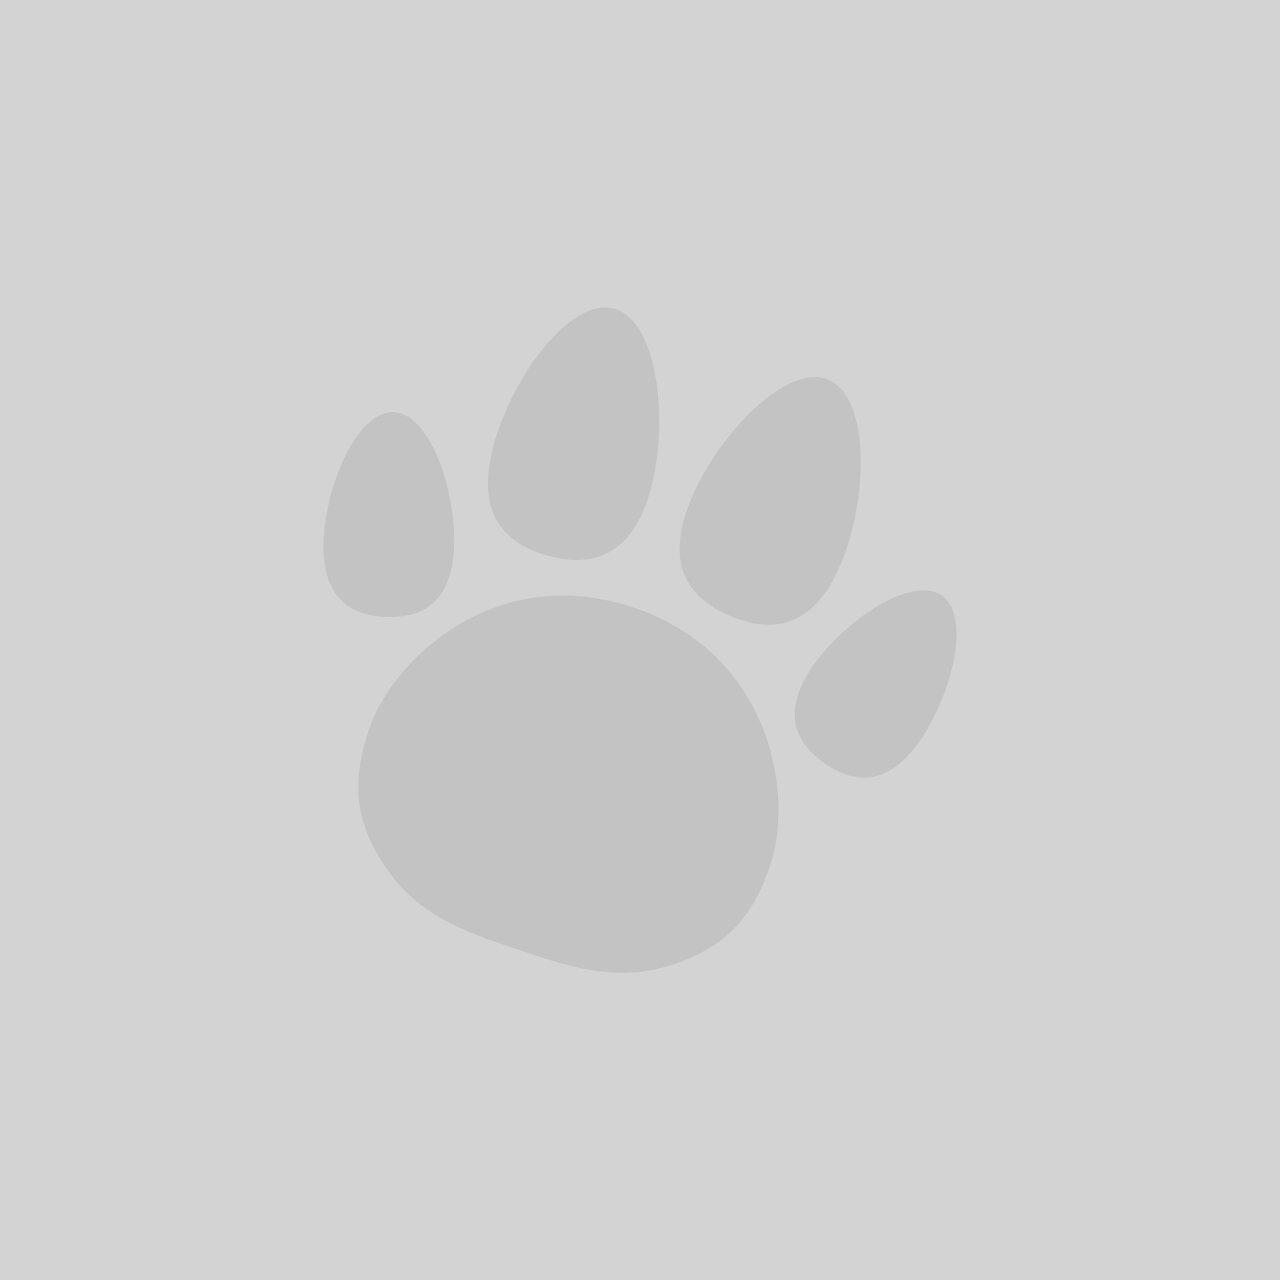 Vetzyme Antibacterial Powder - 40g